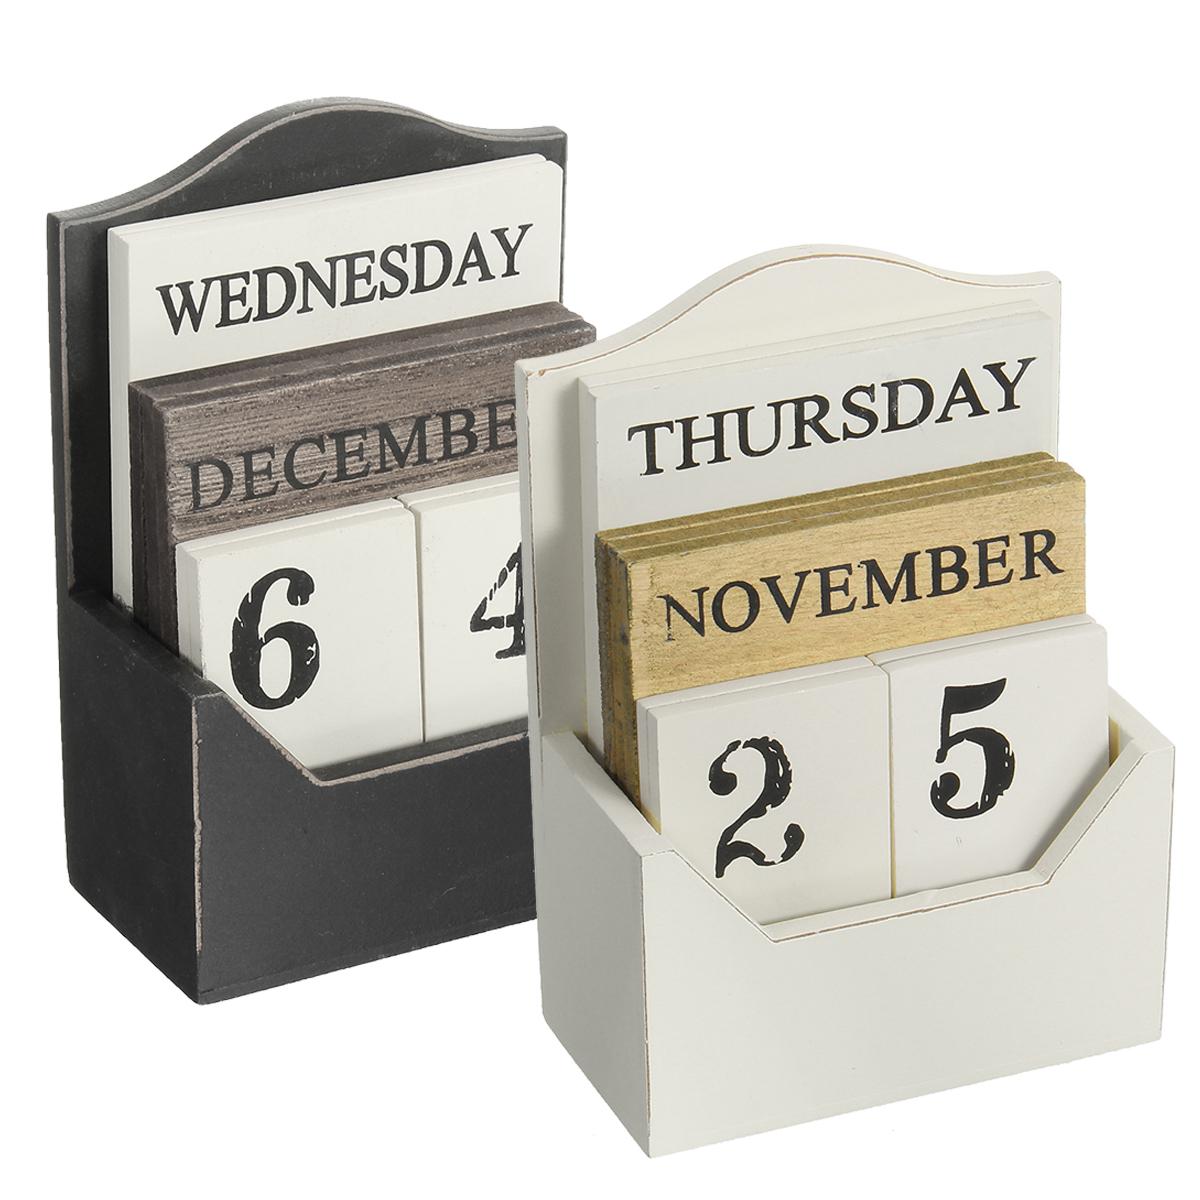 Vintage Wood Block Perpetual Desktop Calendar Rustic Wooden Office Home Desk Decor